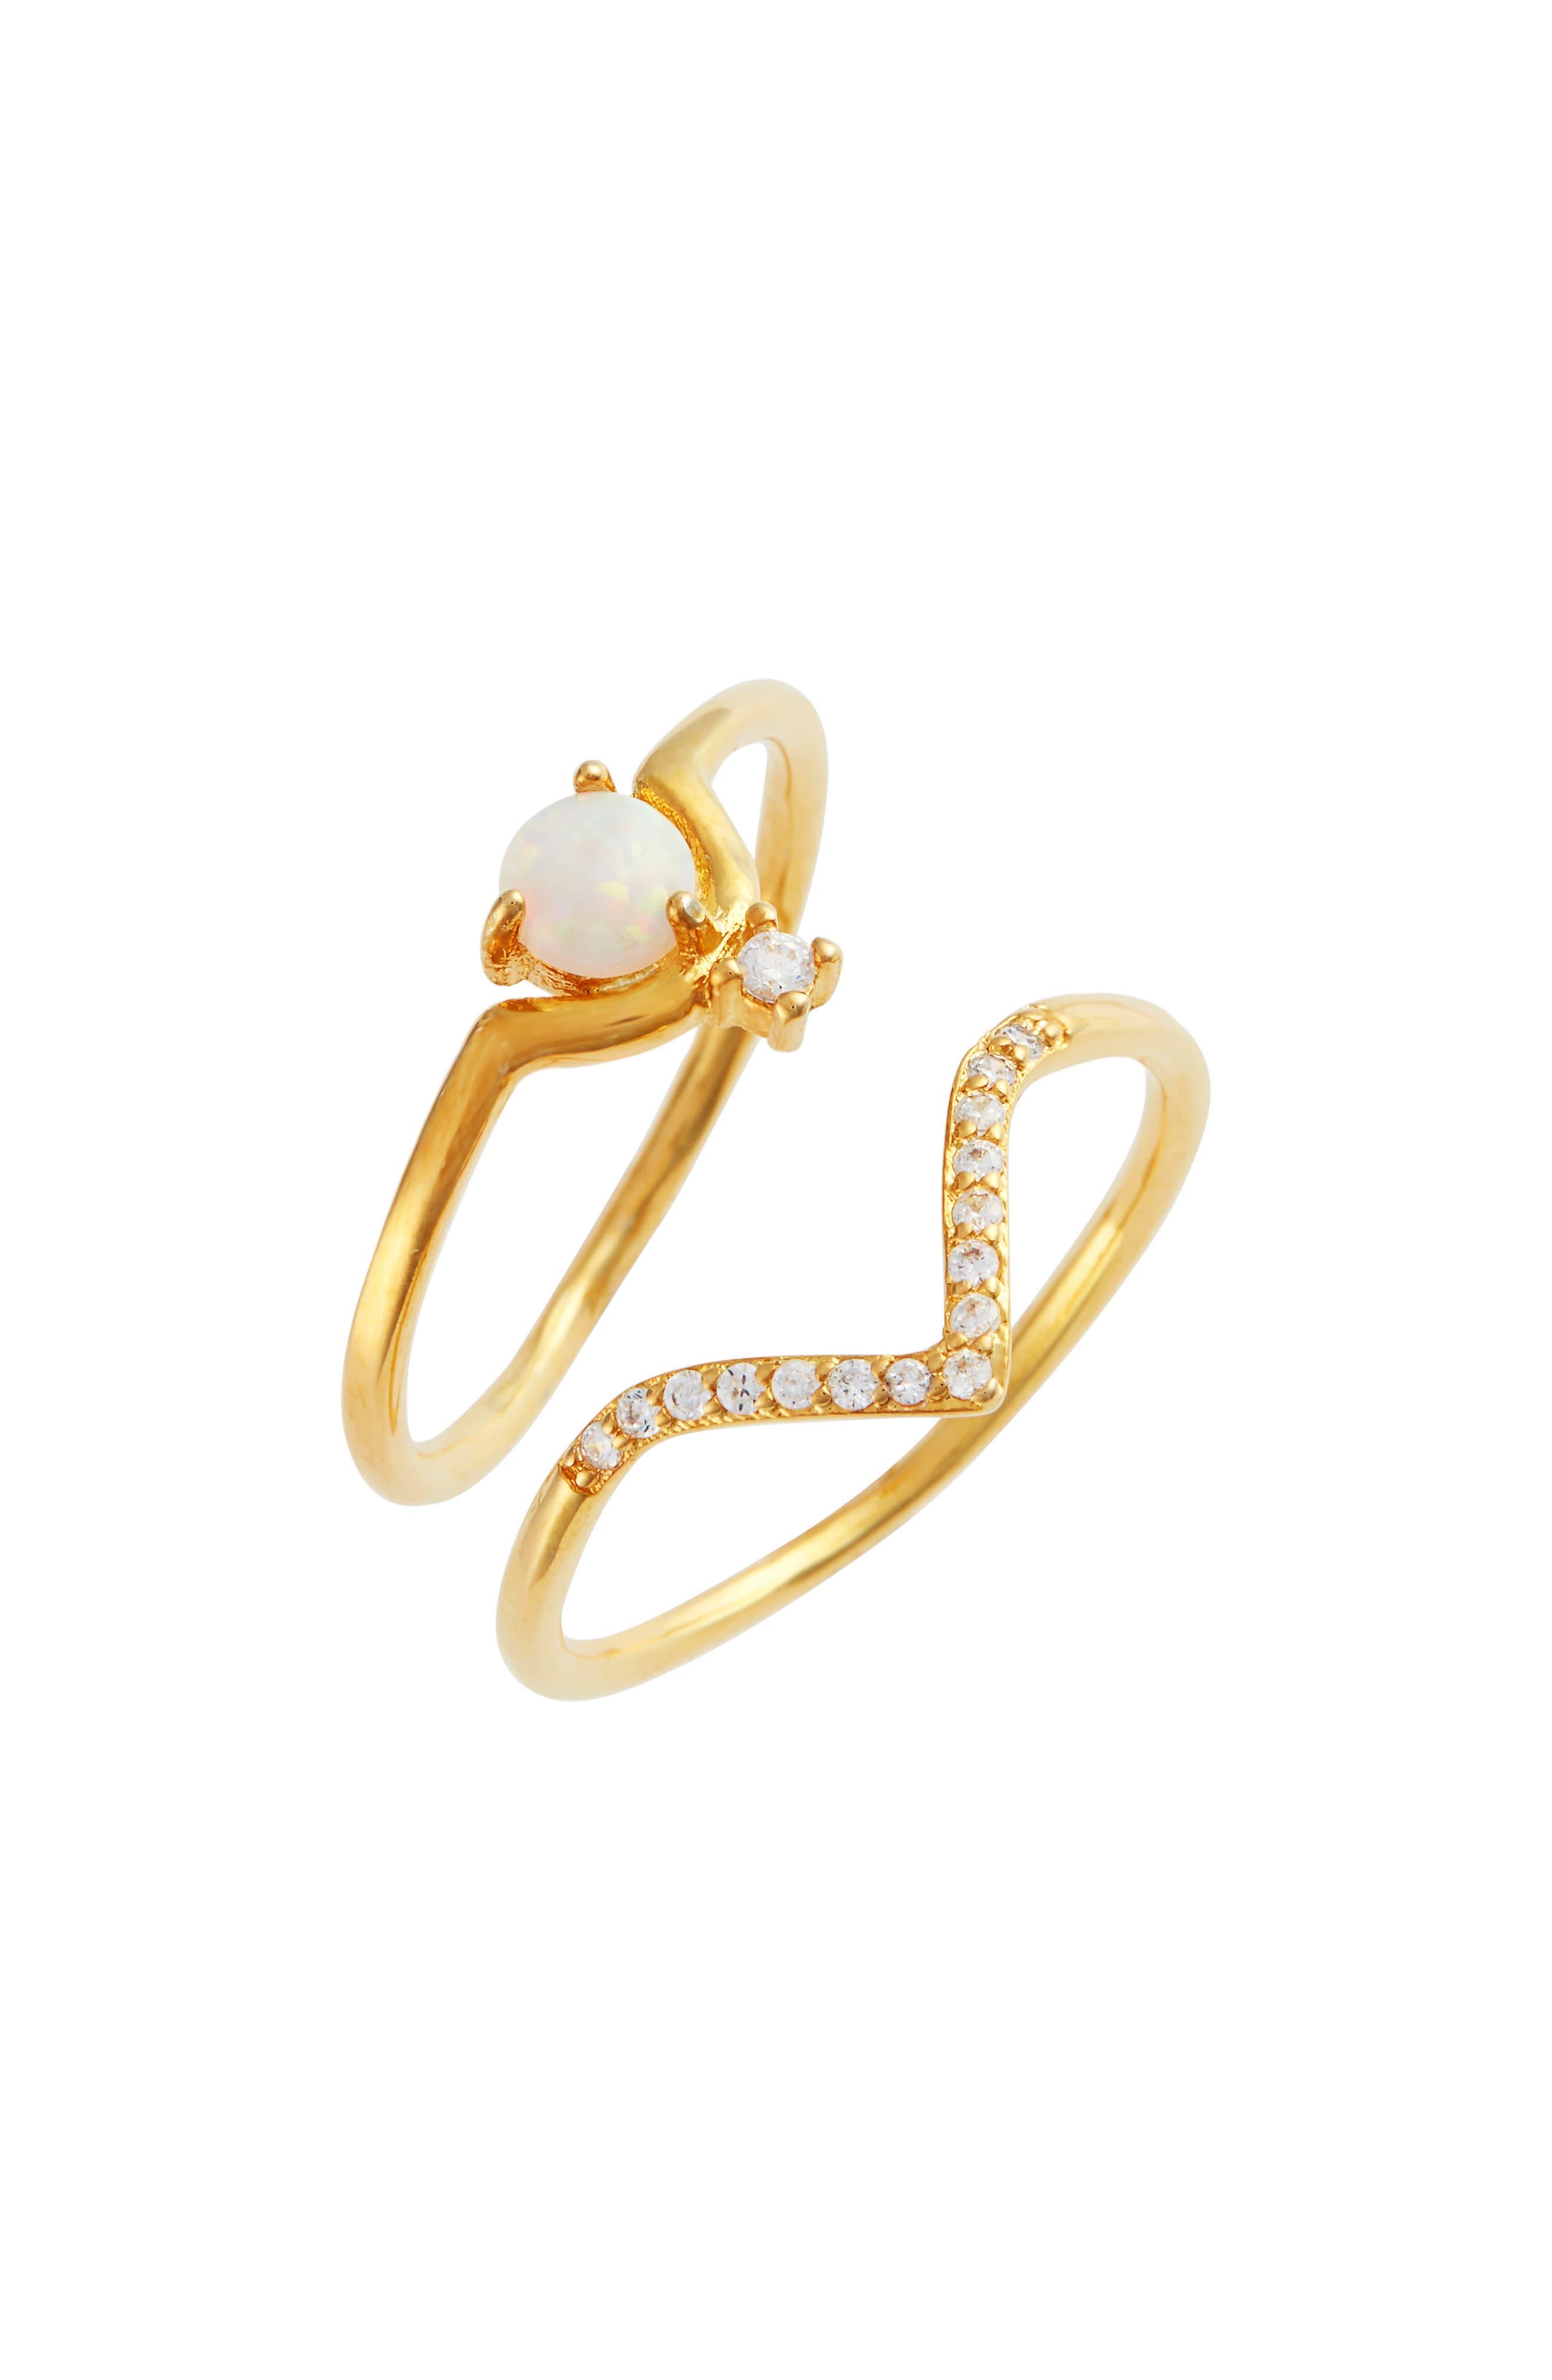 Xenia Set of 2 Fire Opal & Crystal Rings,                             Main thumbnail 1, color,                             710